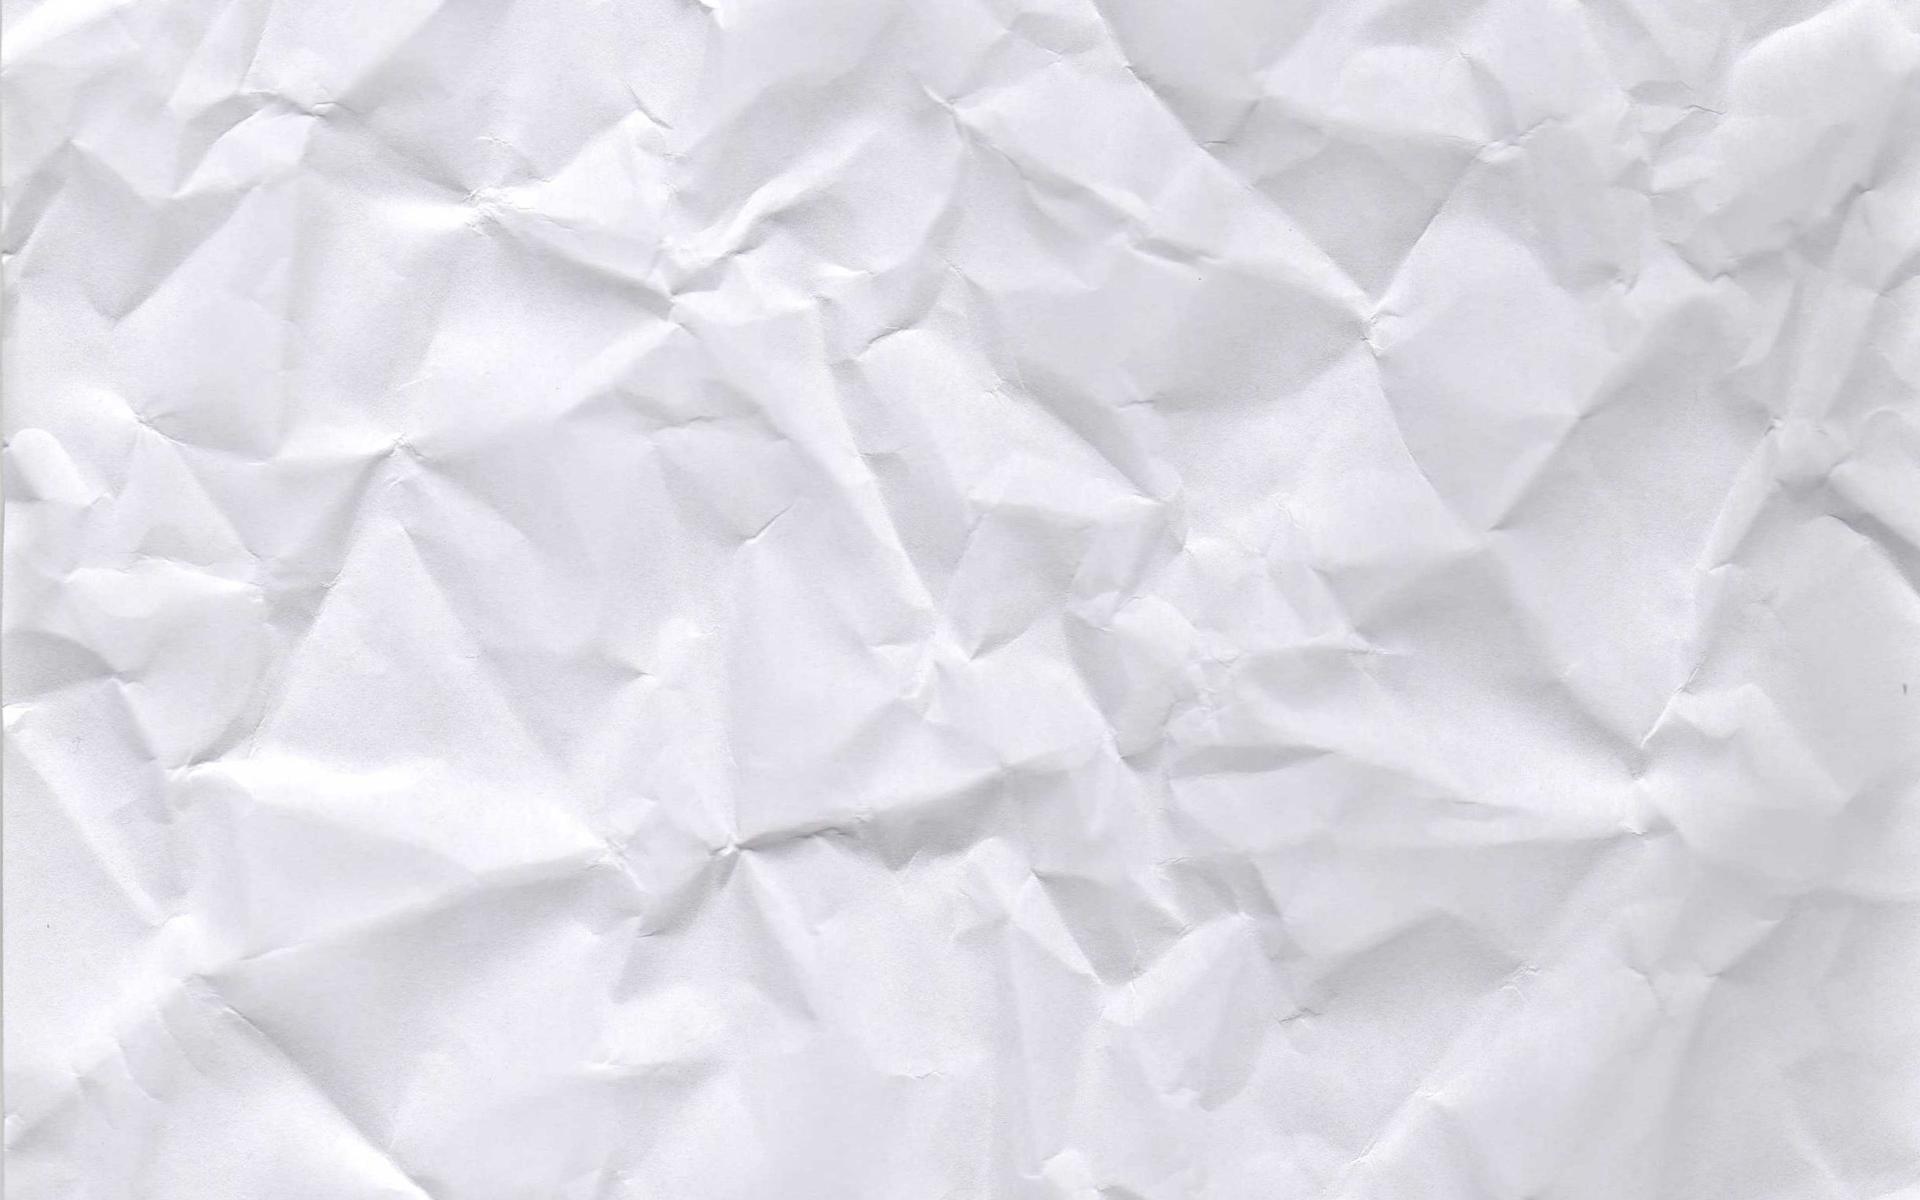 Crumpled White Paper Texture Hd Wallpaper Wallpaper List 1920x1200